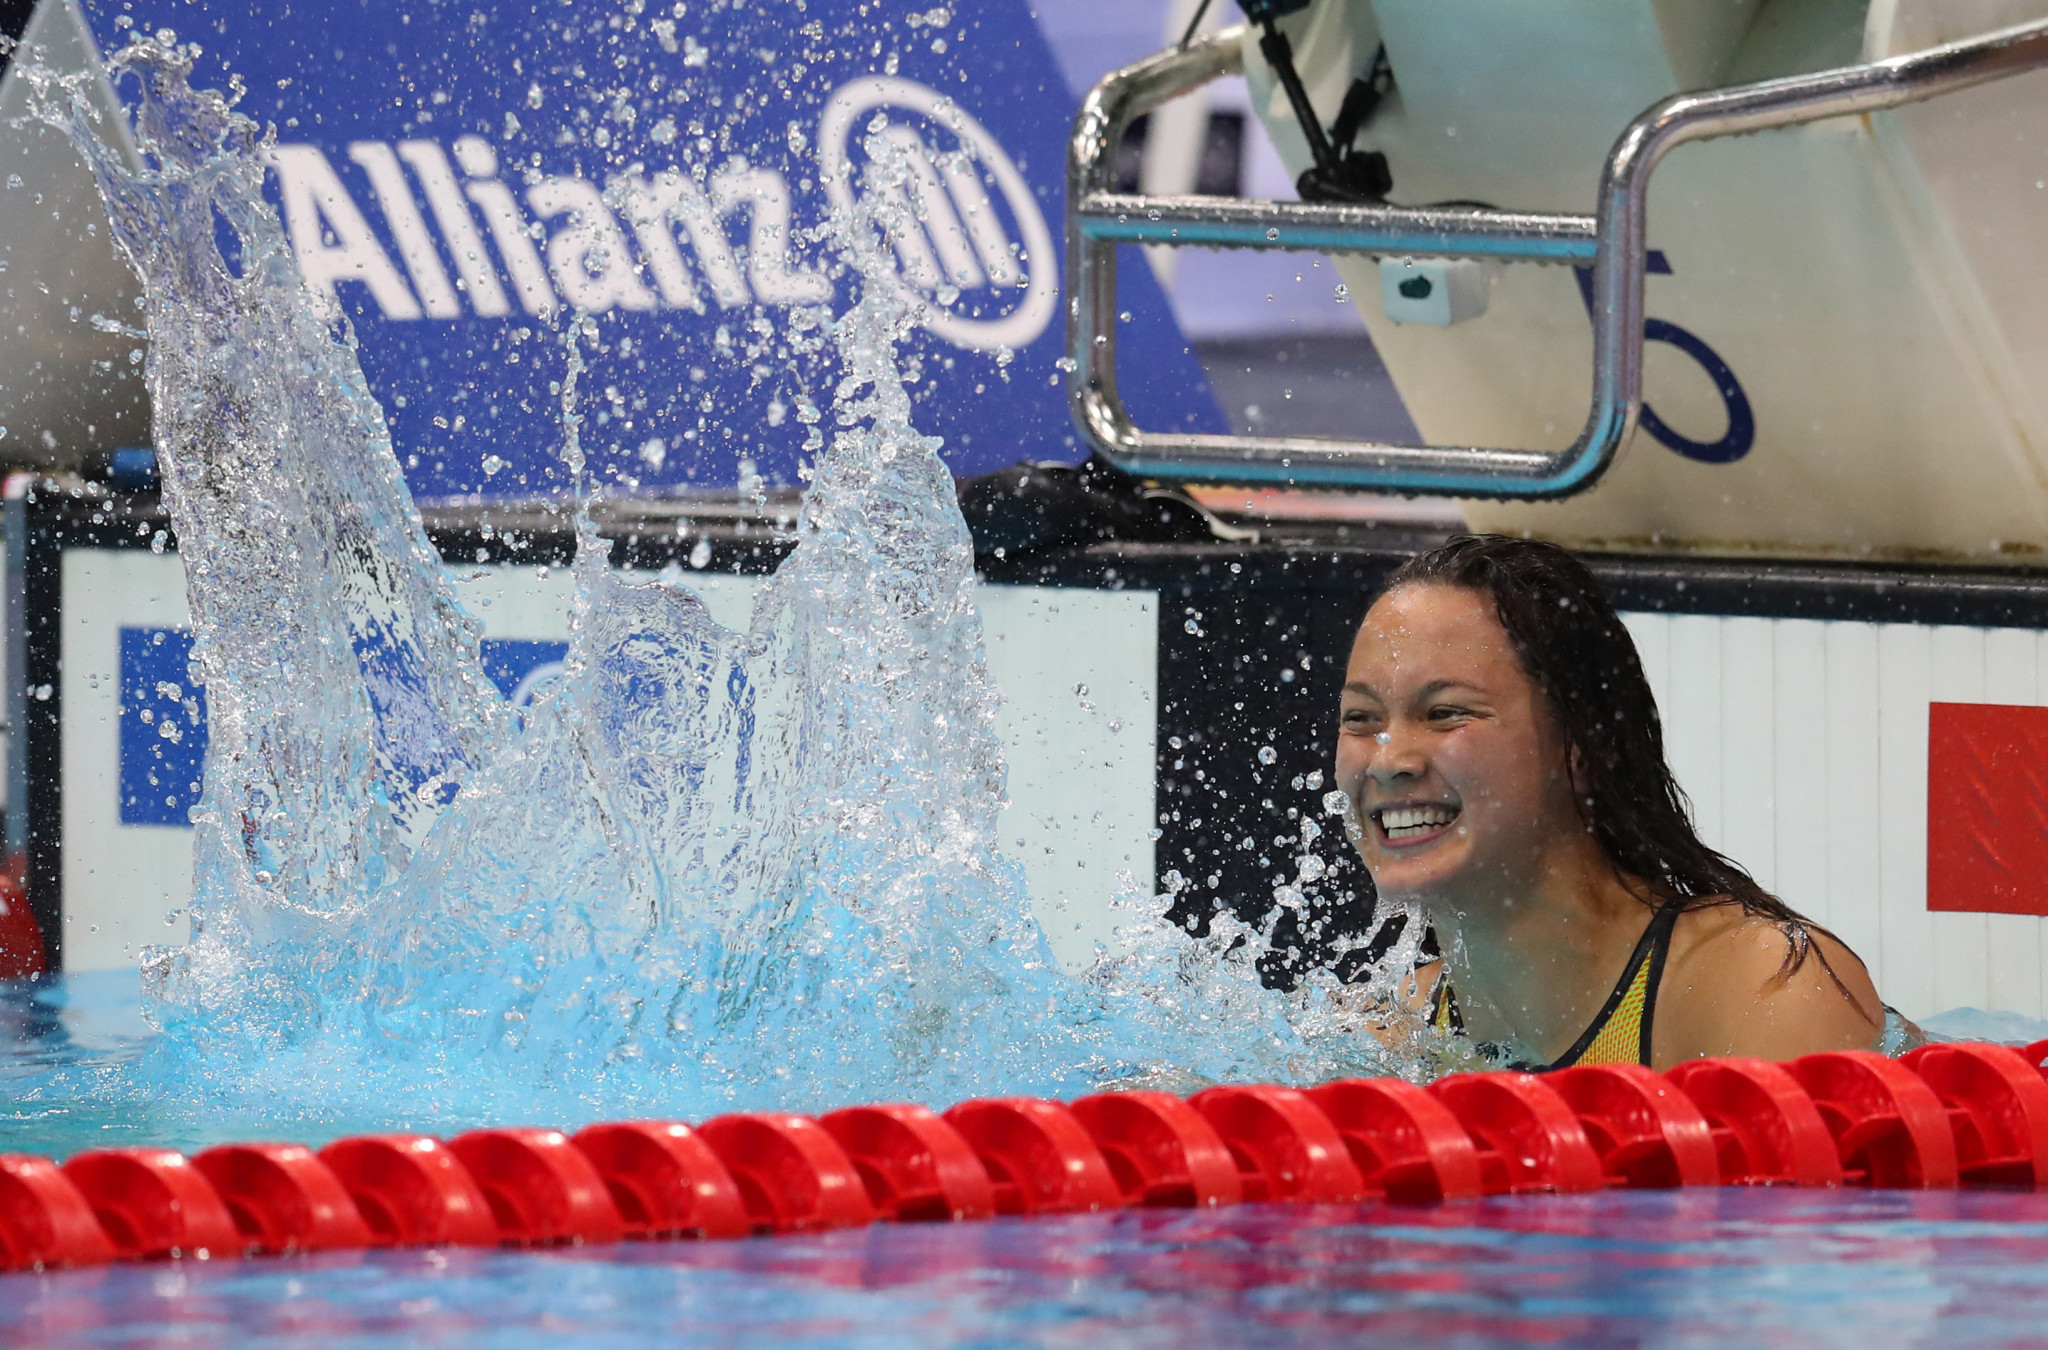 Tai wins seventh gold on final night at World Para Swimming Championships